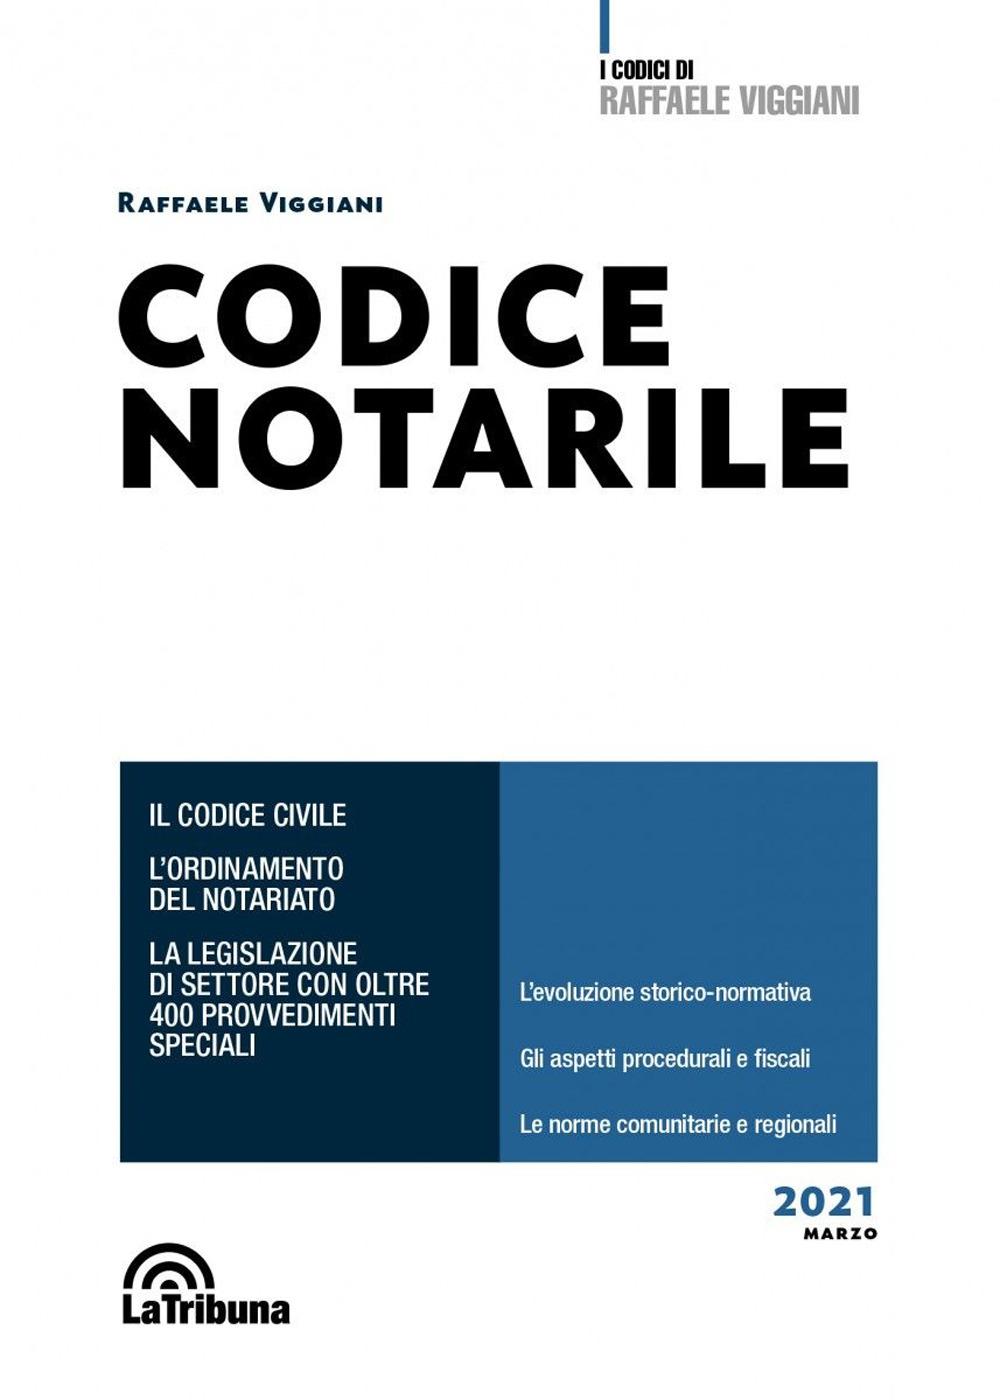 CODICE NOTARILE 2021 – LA TRIBUNA